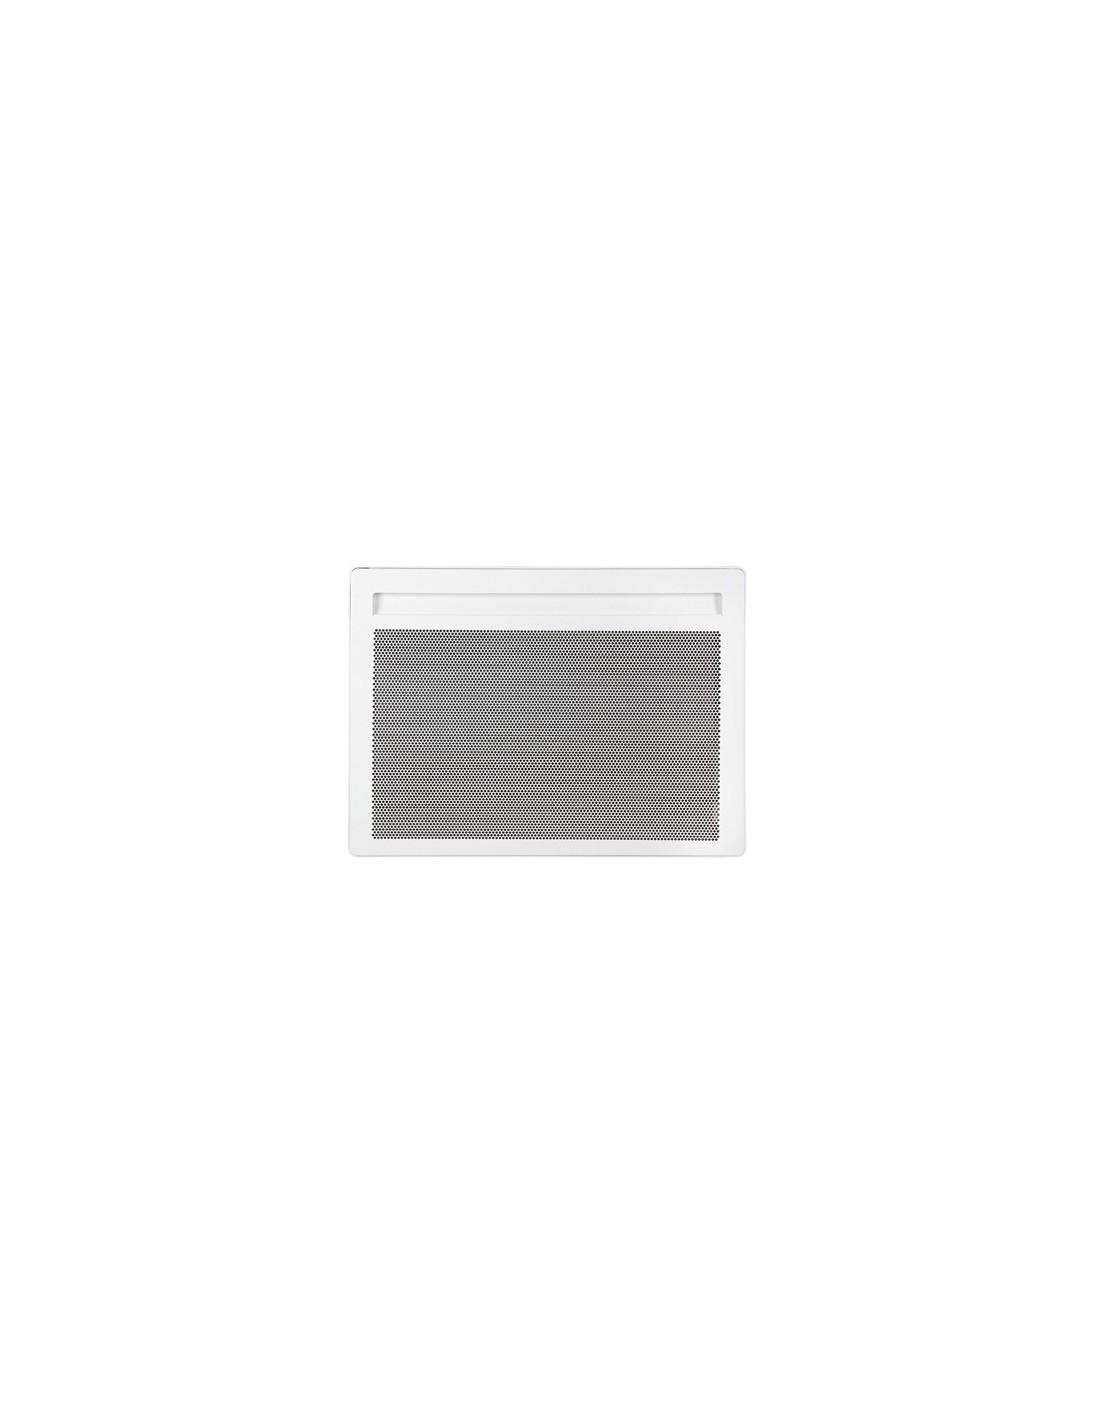 chauffage rayonnant solius atlantic 1250w. Black Bedroom Furniture Sets. Home Design Ideas